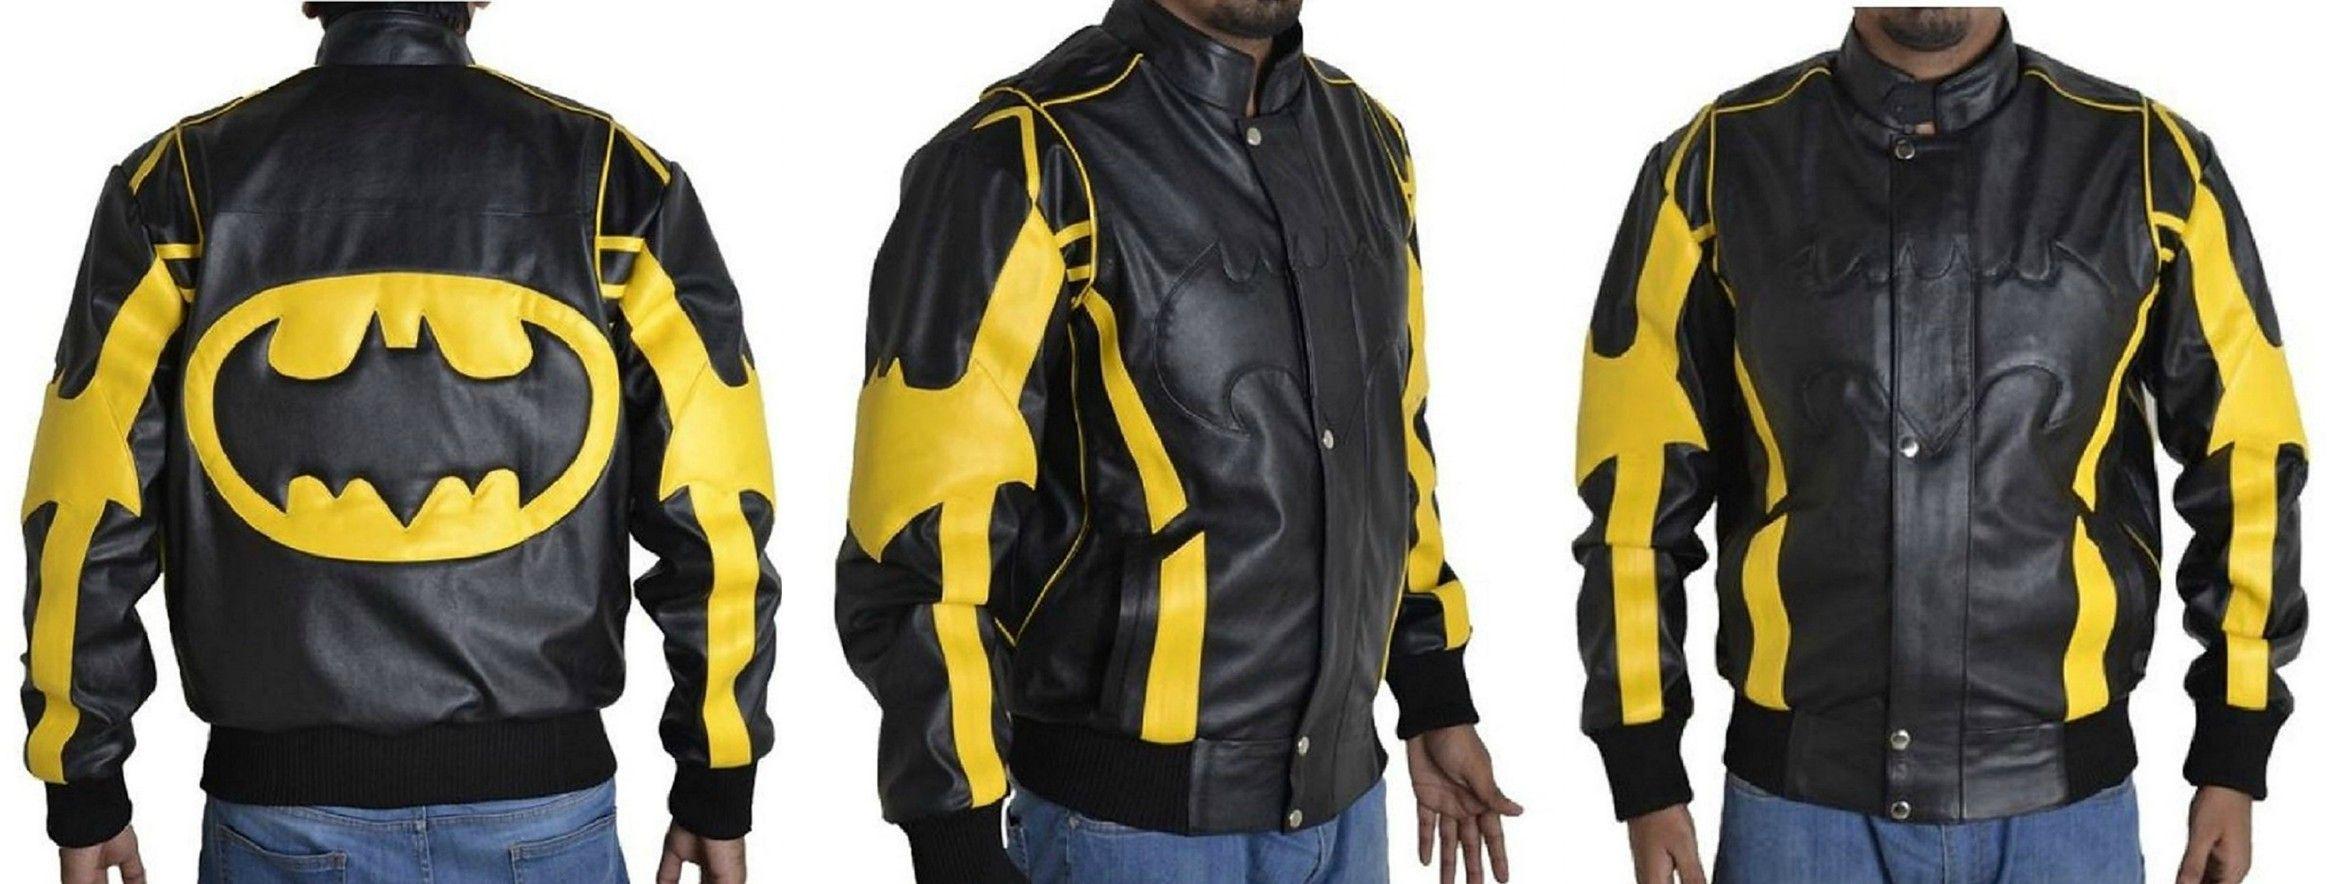 Inspiring From The Batman Character Xtreemleather Present Batman Black Yellow Leather Jacket To All Batman Fans This T Leather Jacket Jackets Black N Yellow [ 884 x 2347 Pixel ]